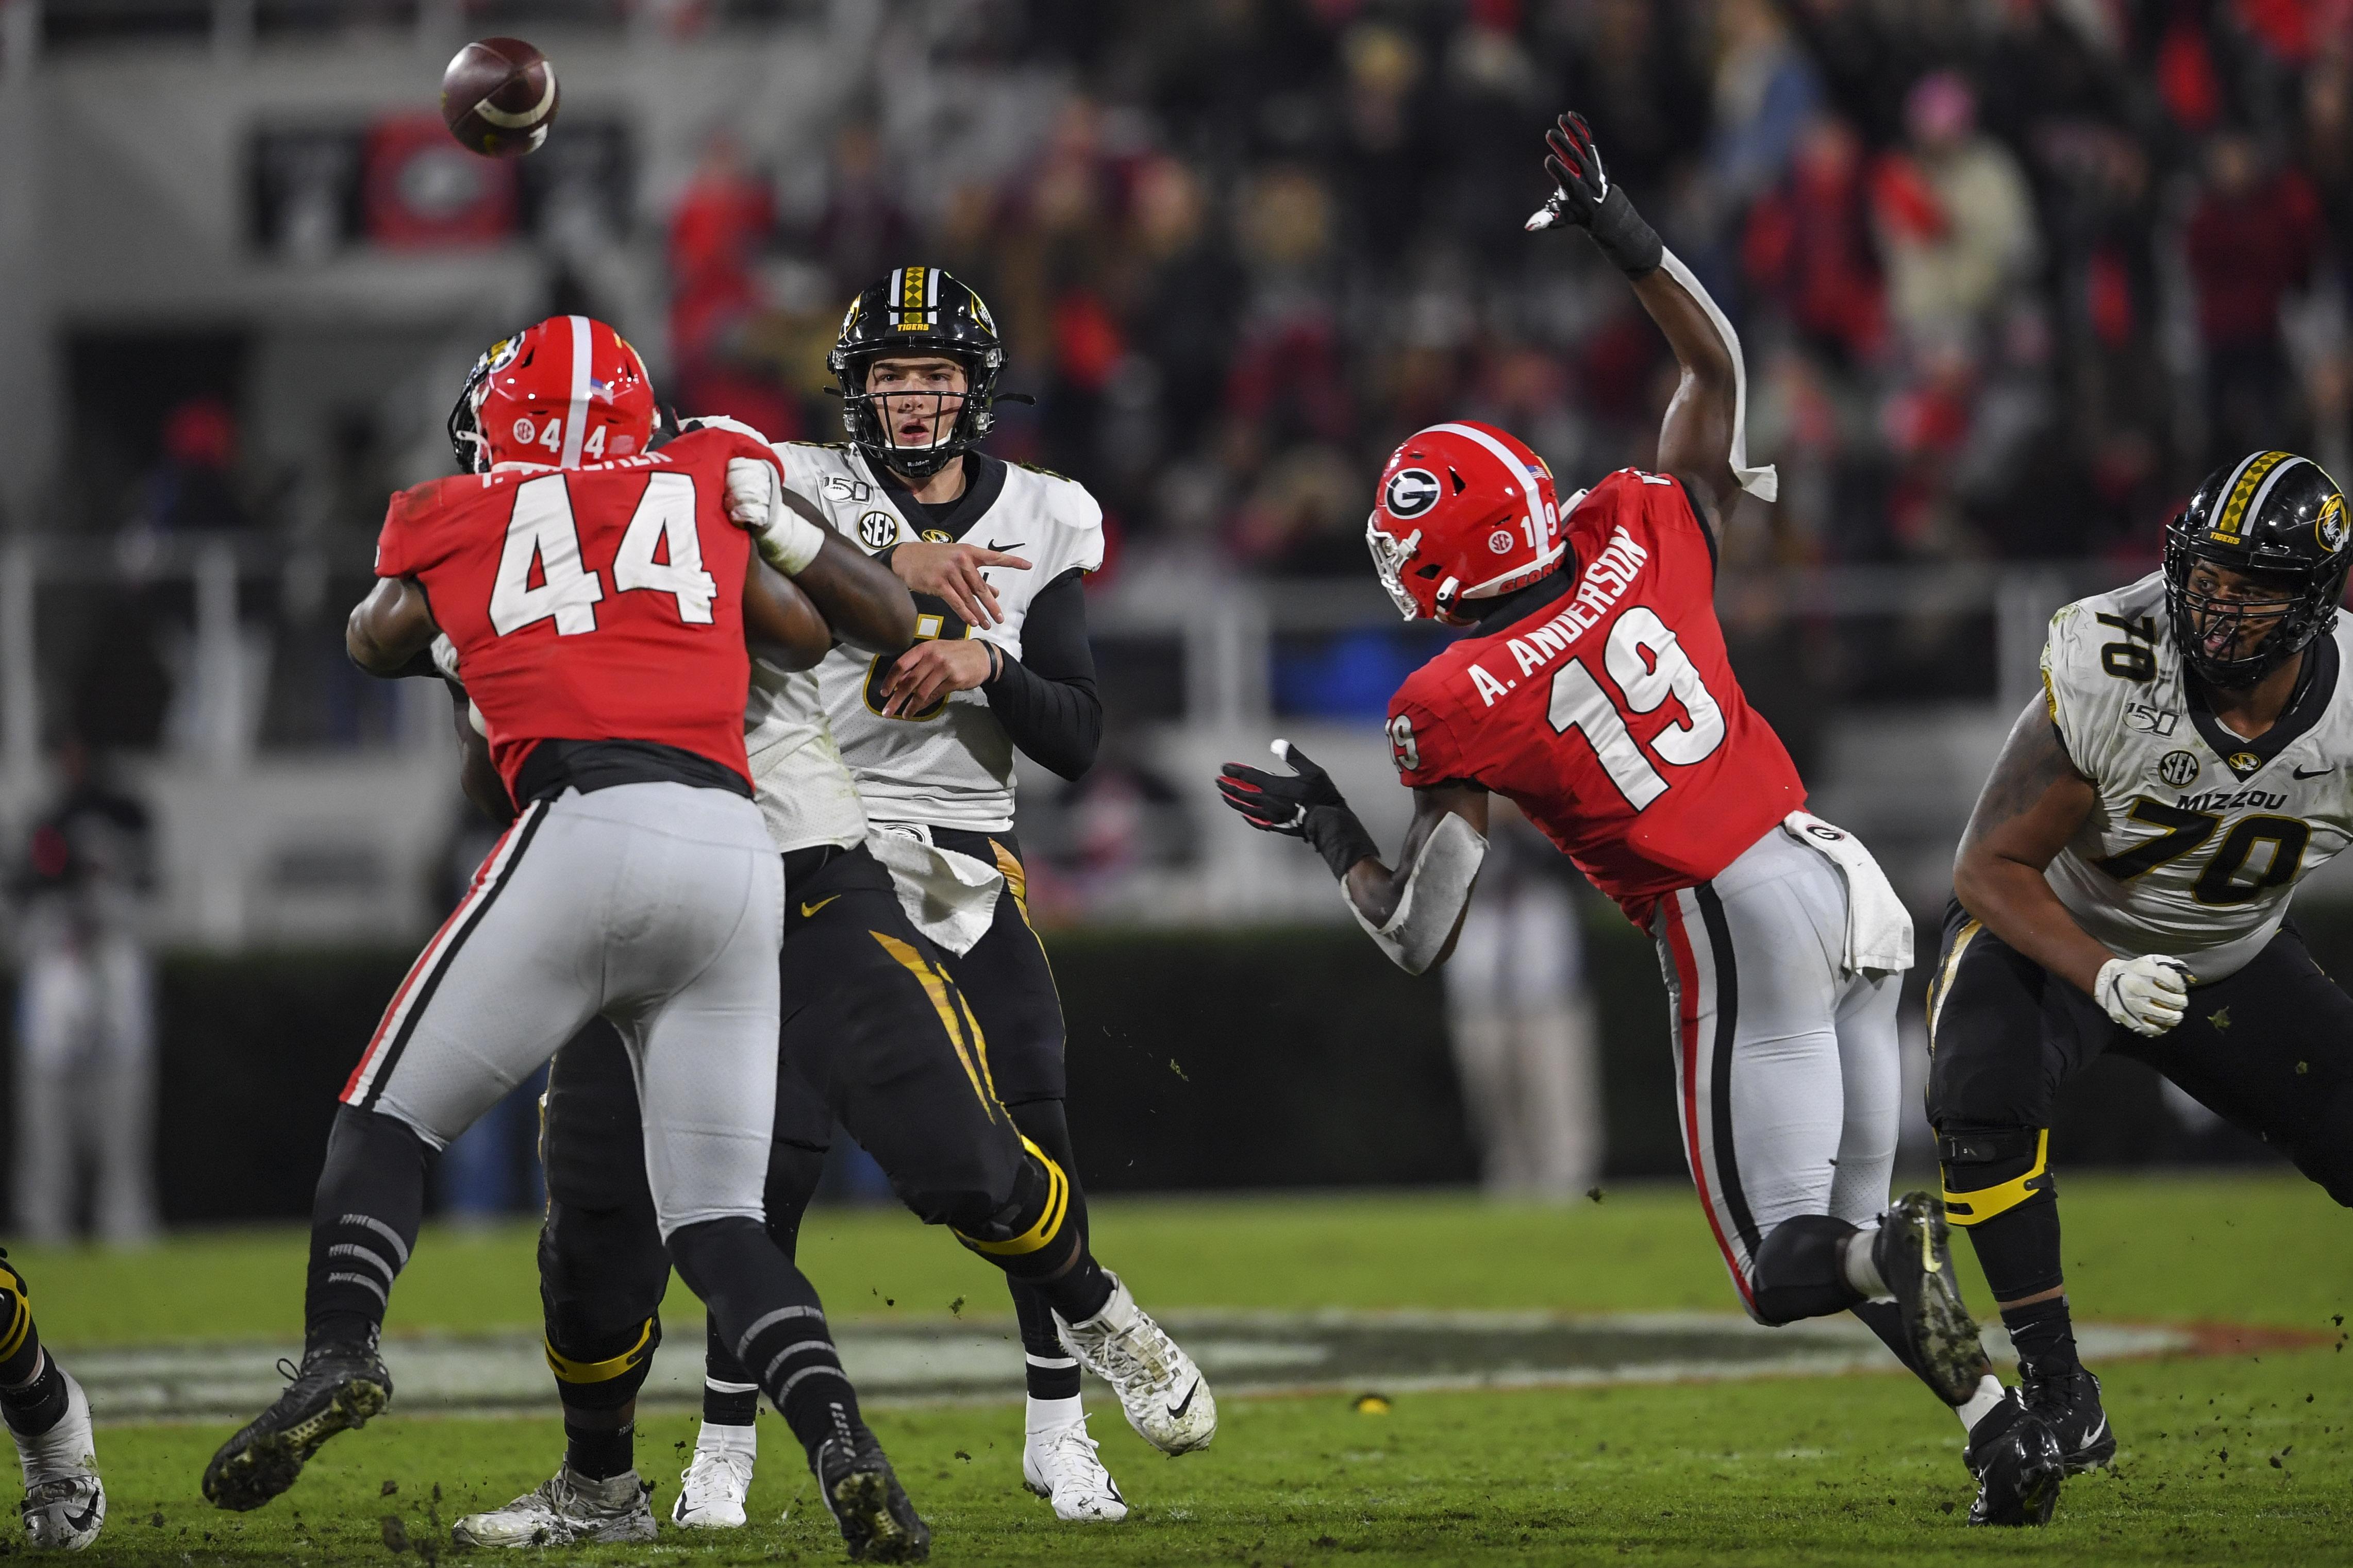 NCAA Football: Missouri at Georgia